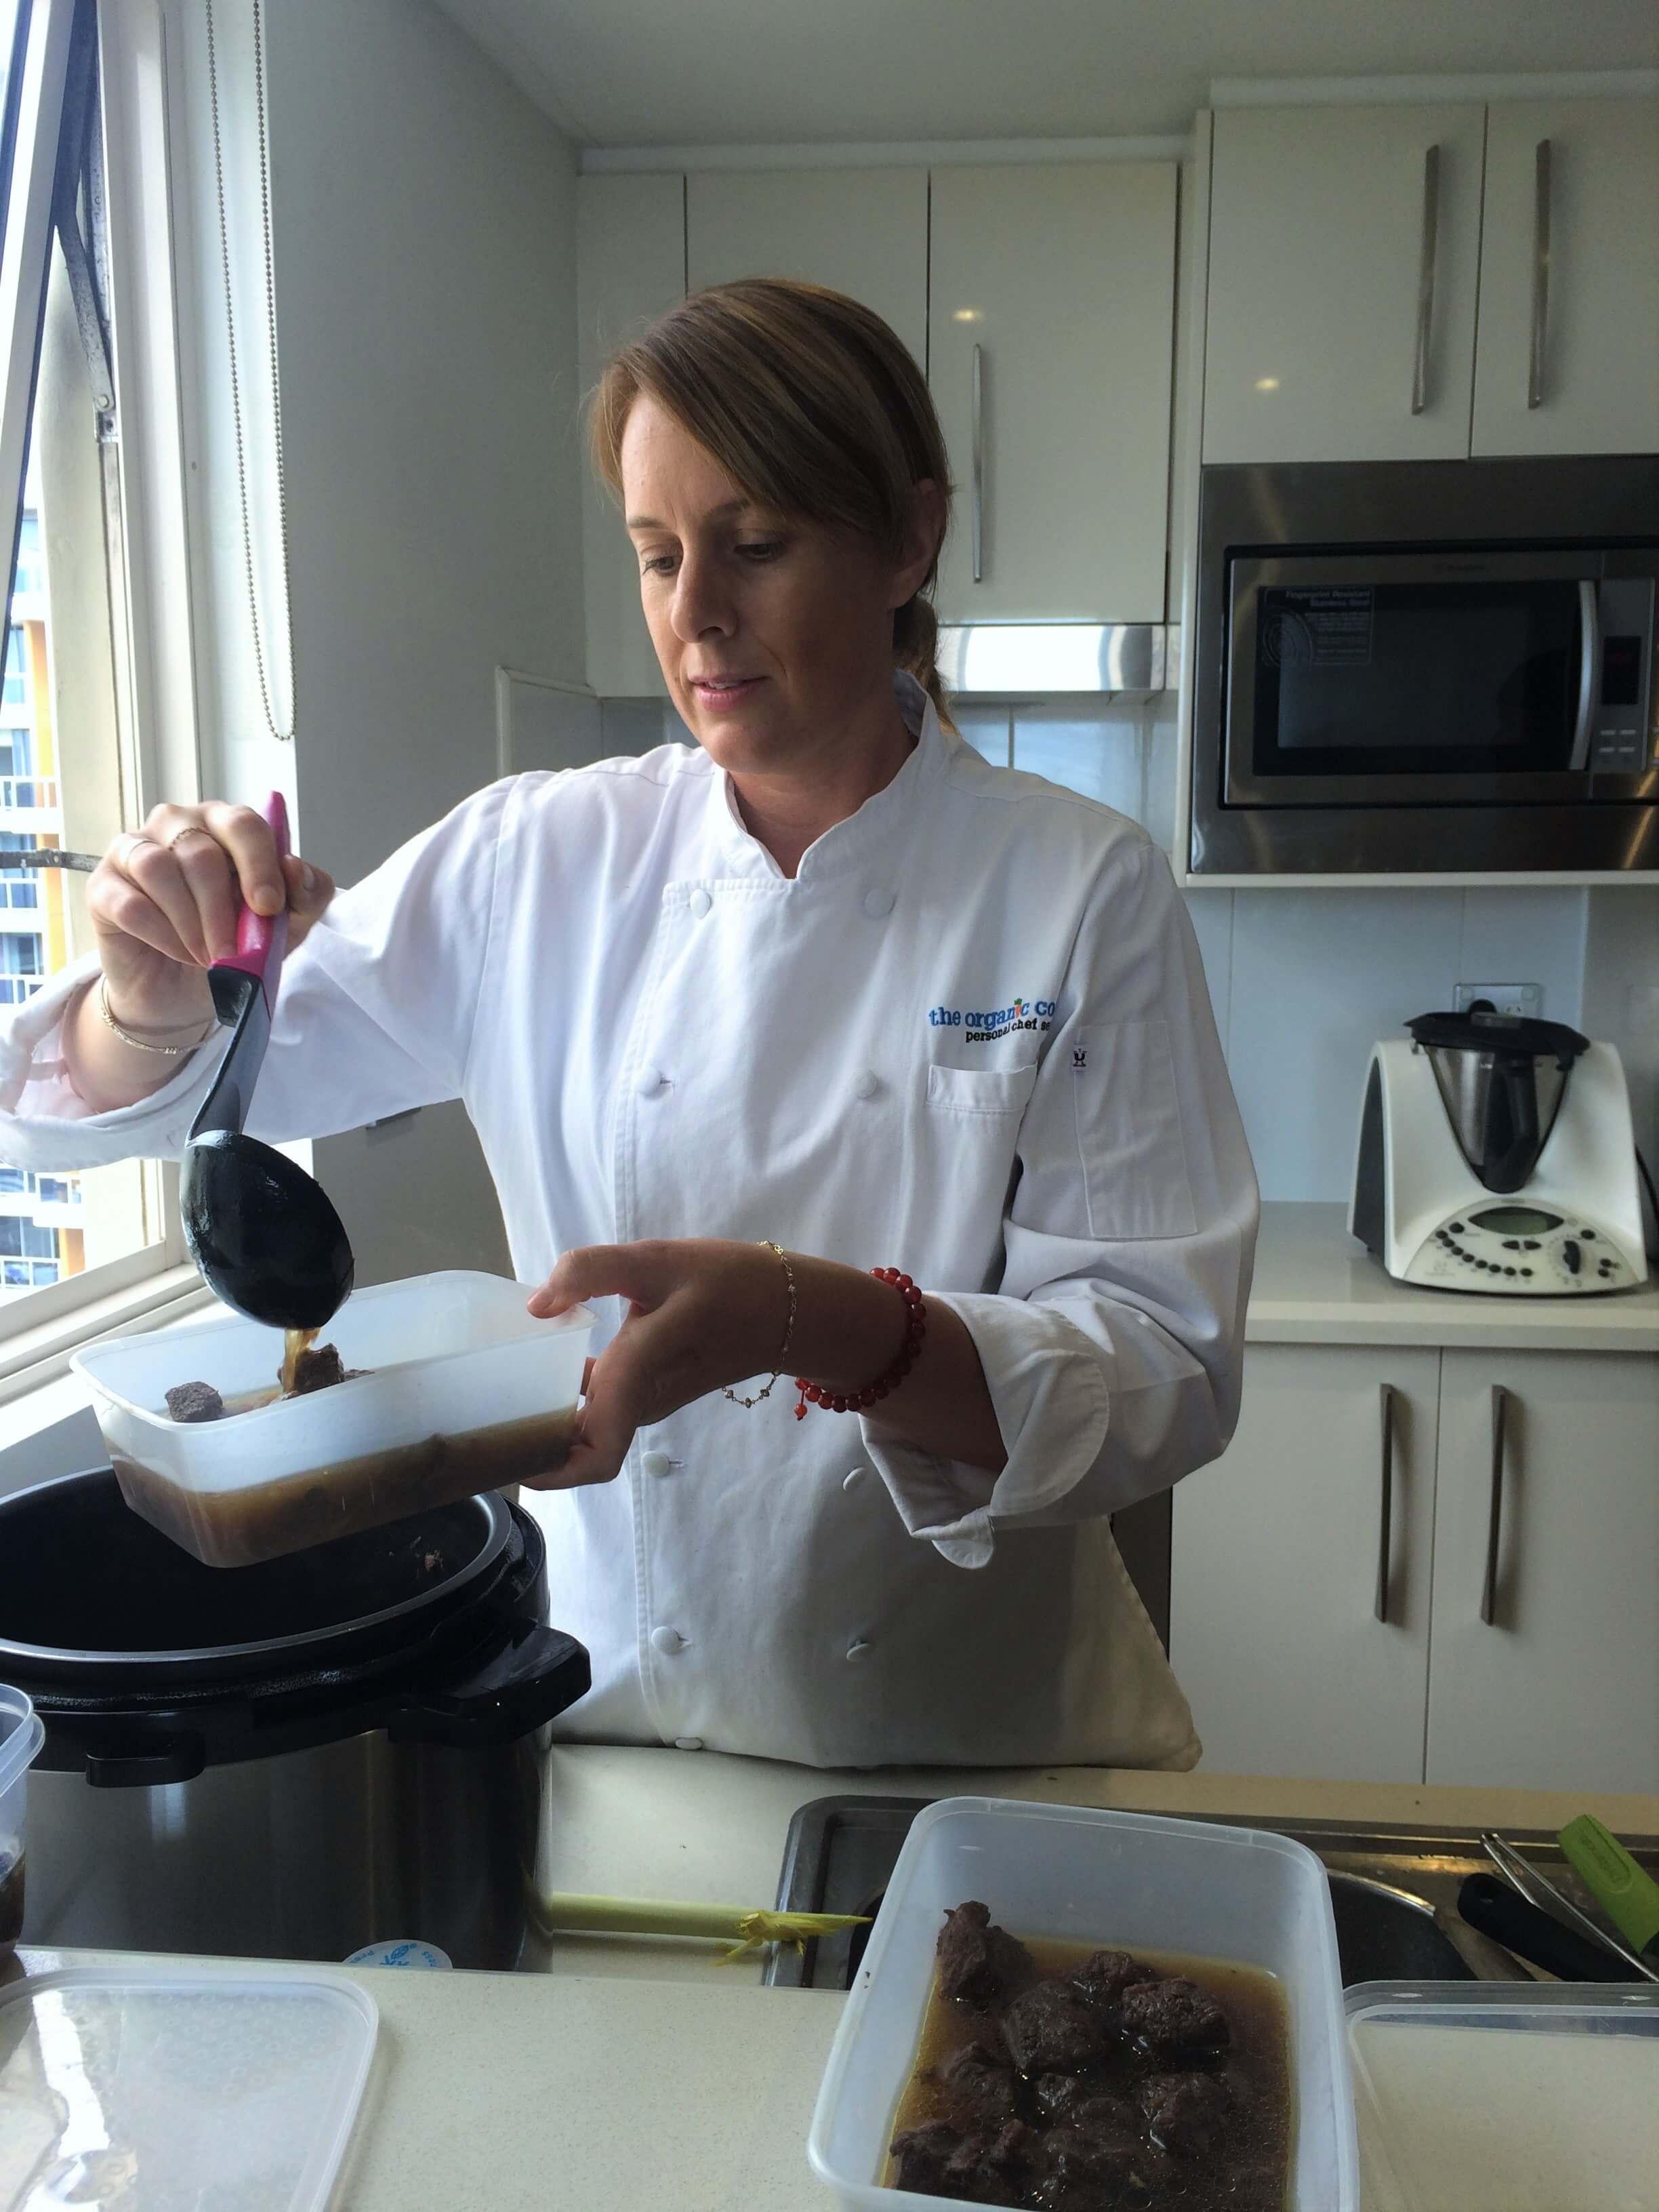 Batch cooking pressure cooker